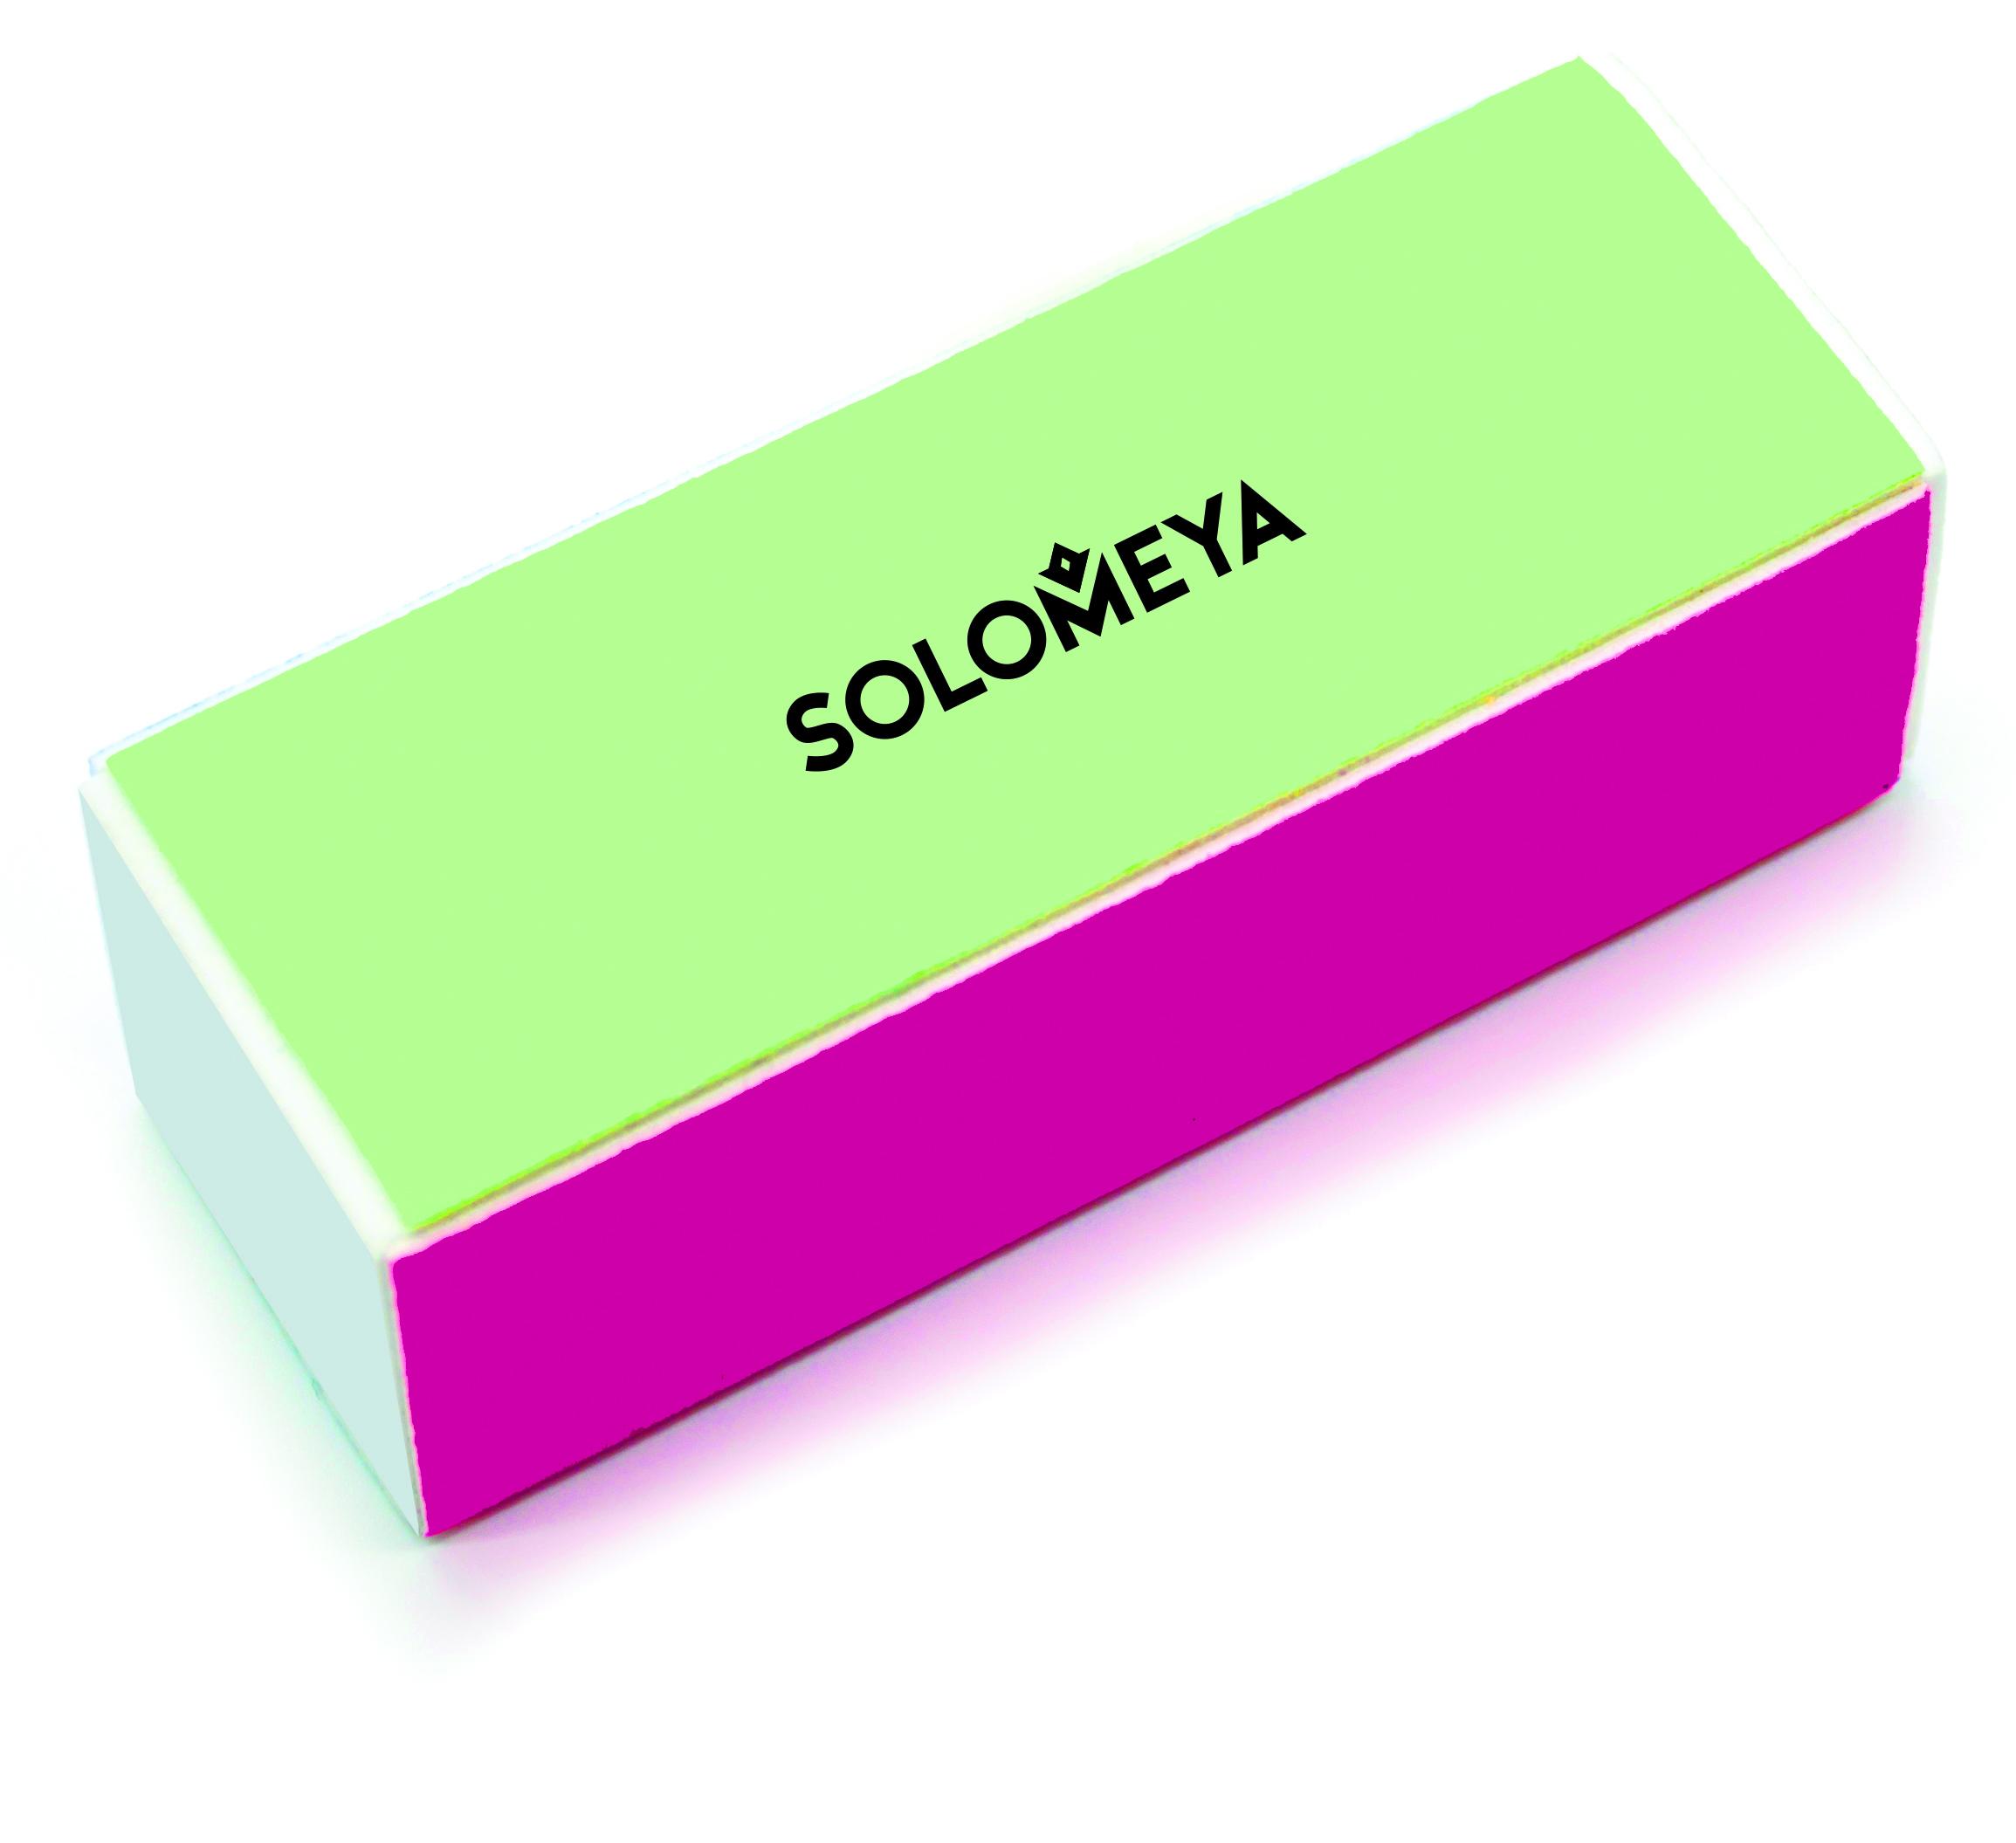 SOLOMEYA Блок-полировщик 4-х сторонний для ногтей / 4 WAY BLOCK BUFFER